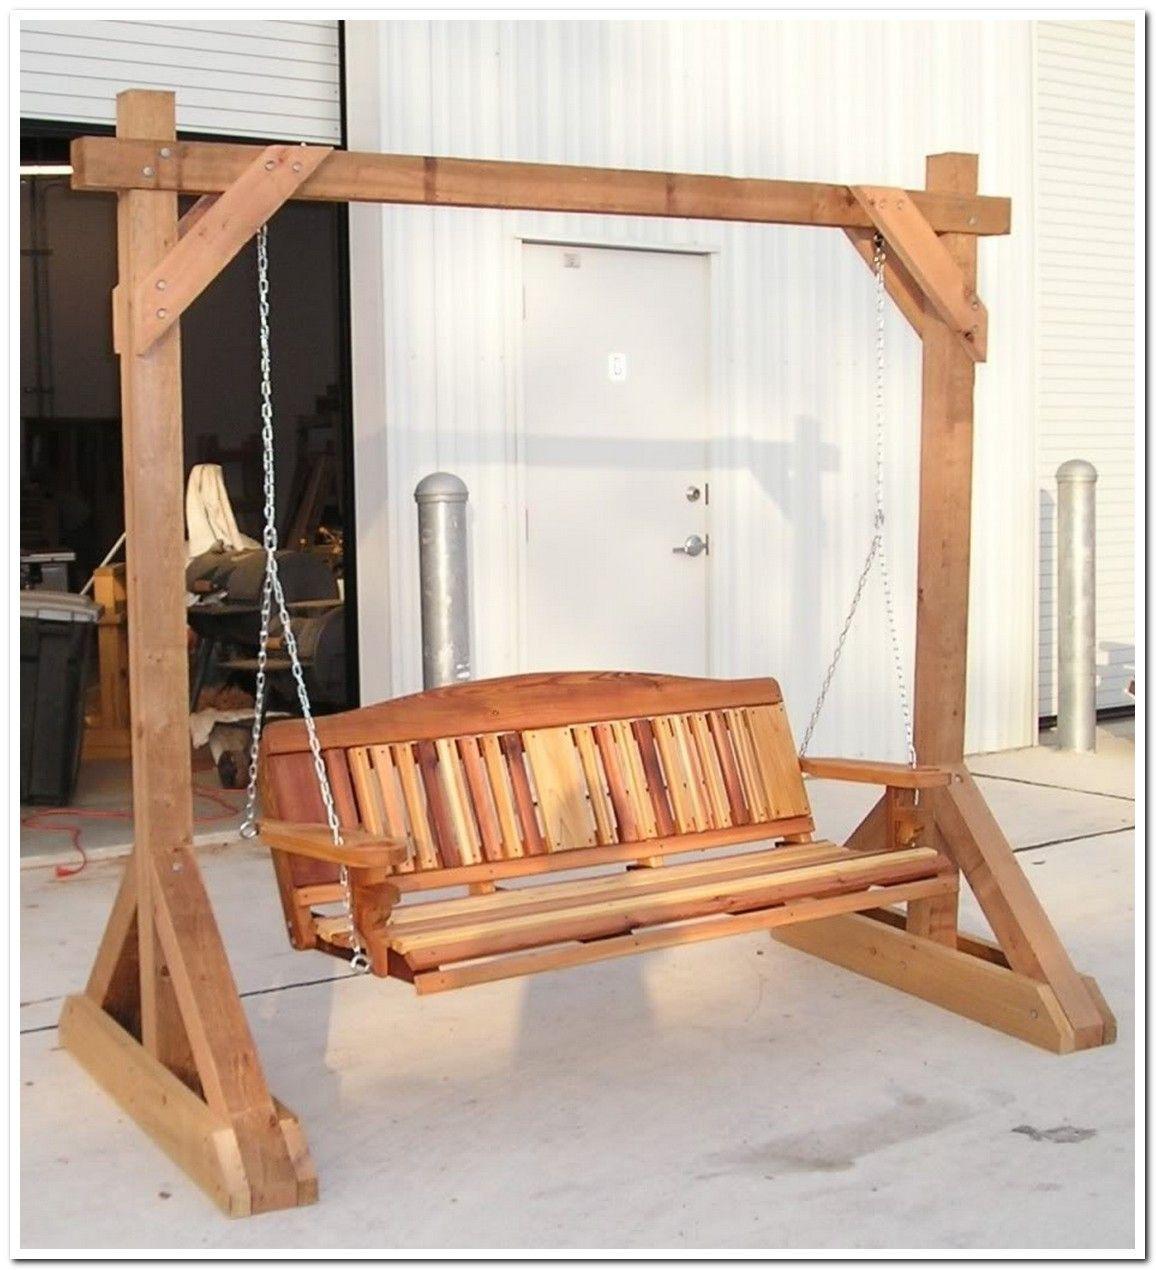 Outdoor swing frame rattanfurnitureproduct